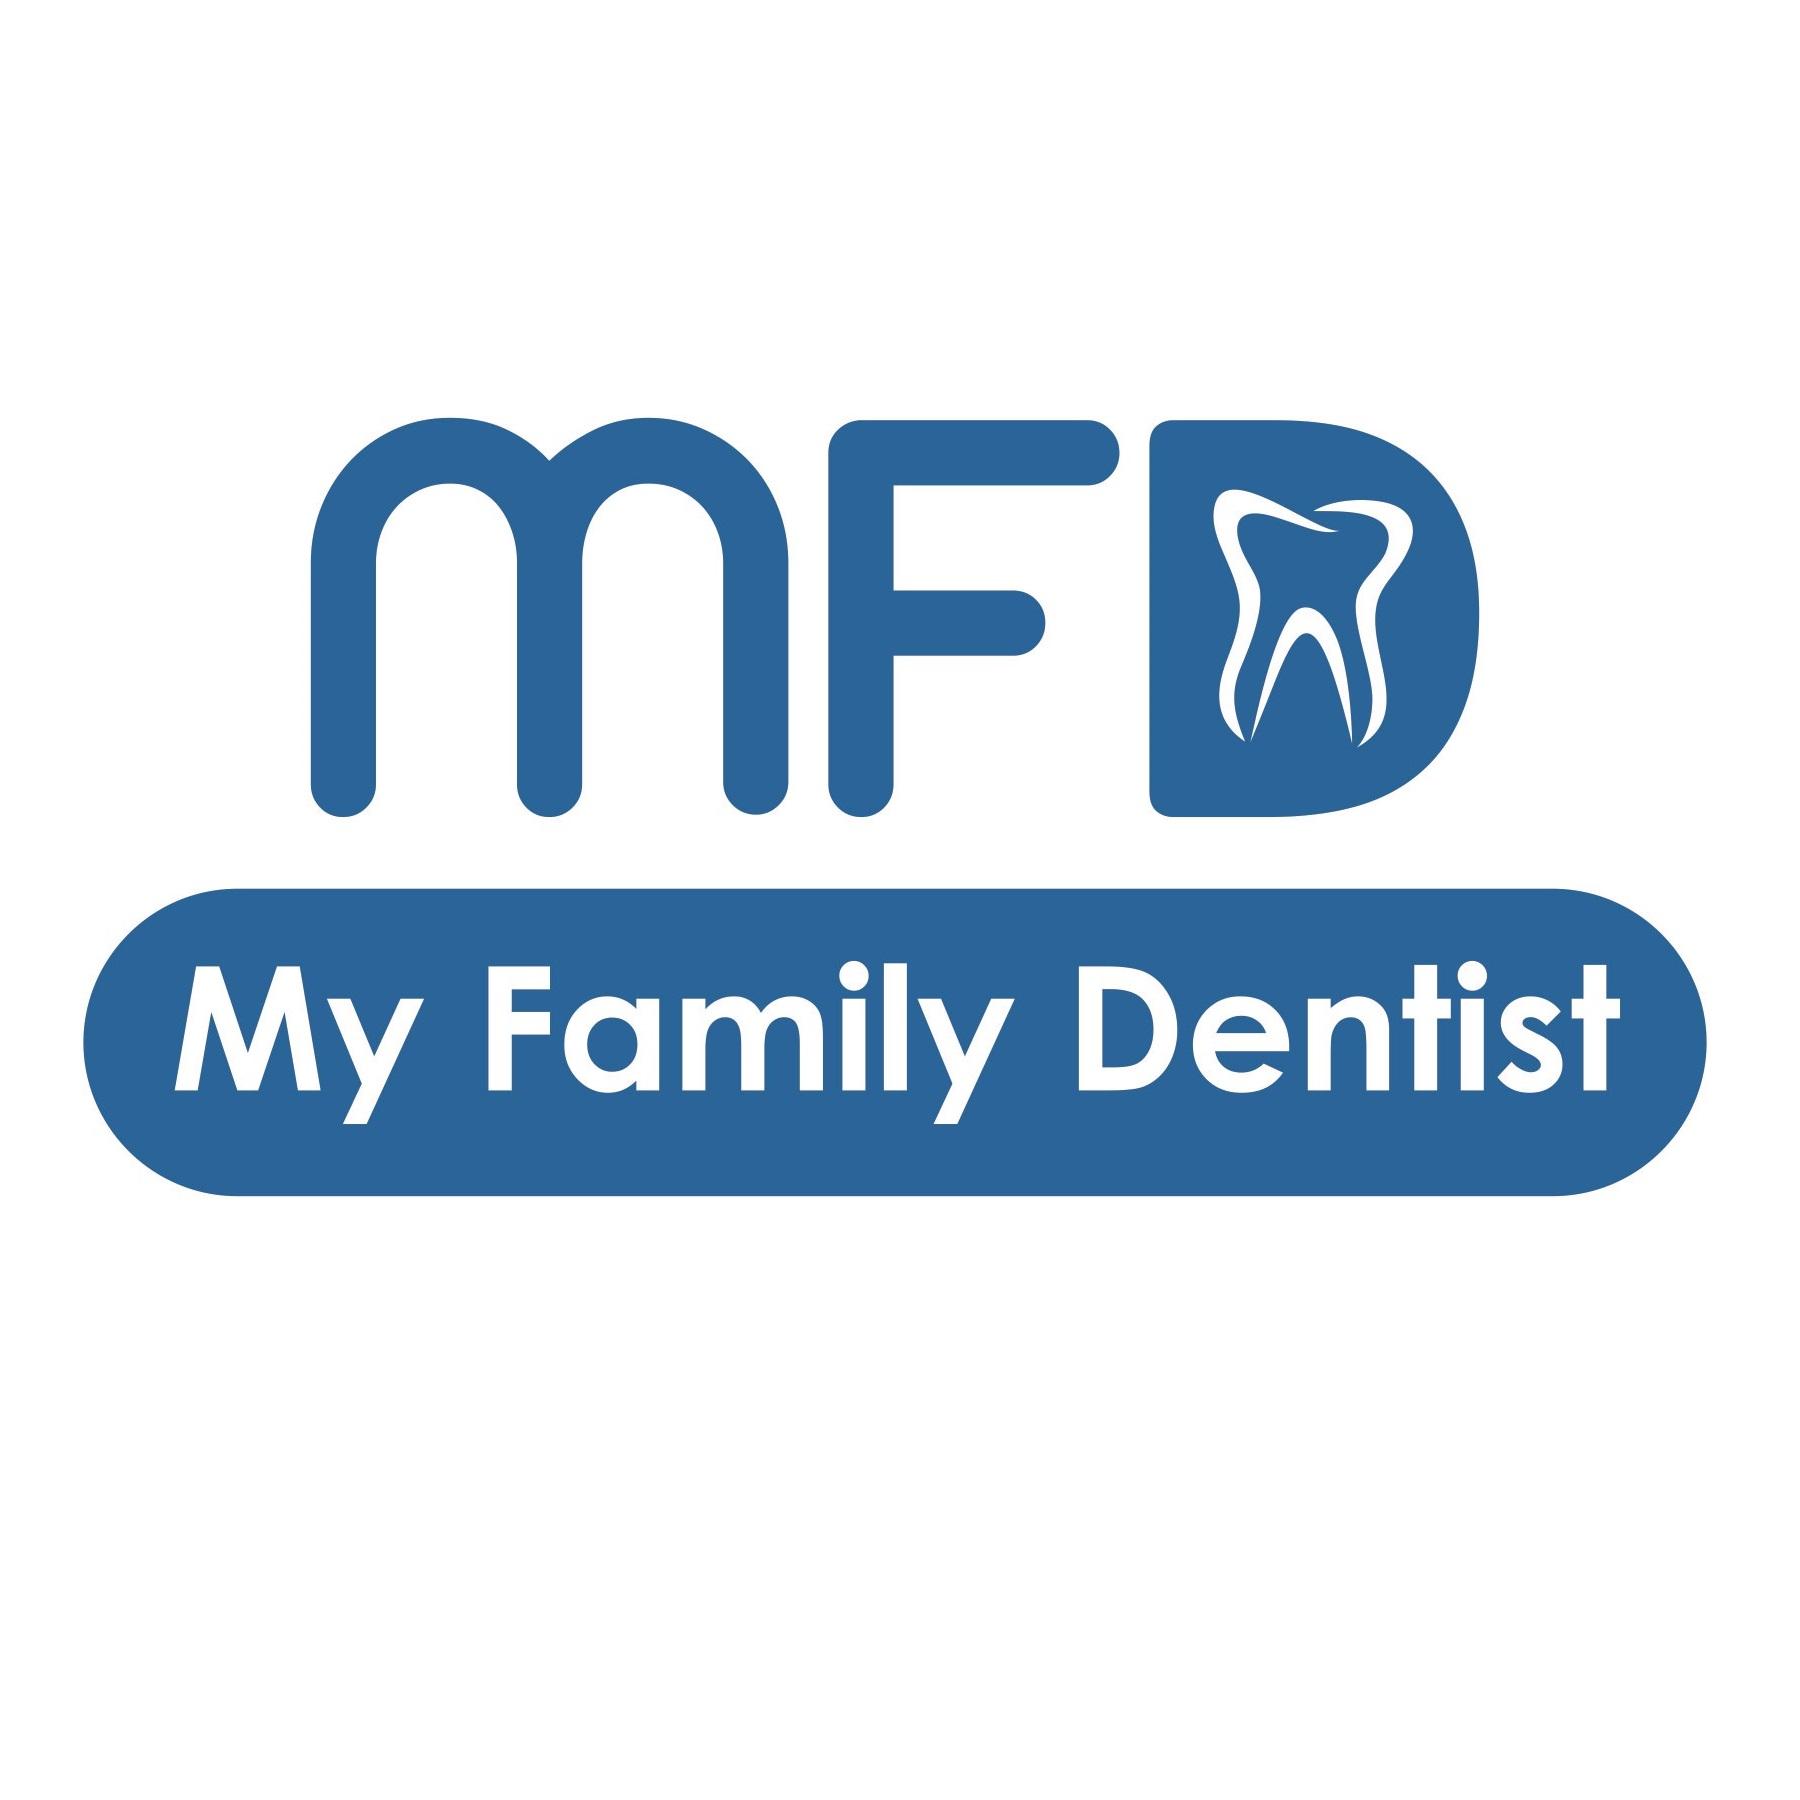 My Family Dentist